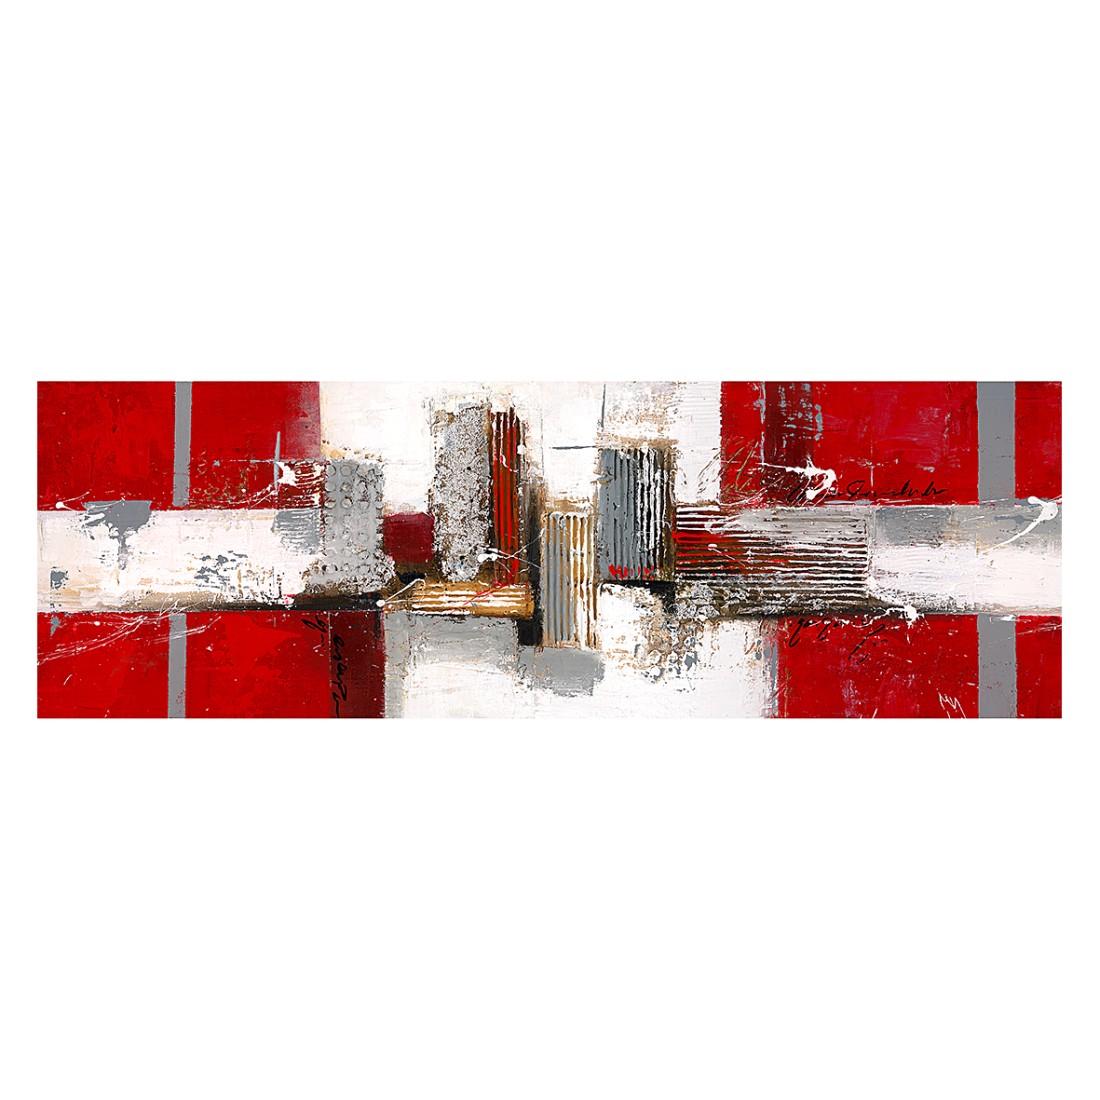 Home 24 - Peinture abstraktion vii - 120 x 40 cm, pro art